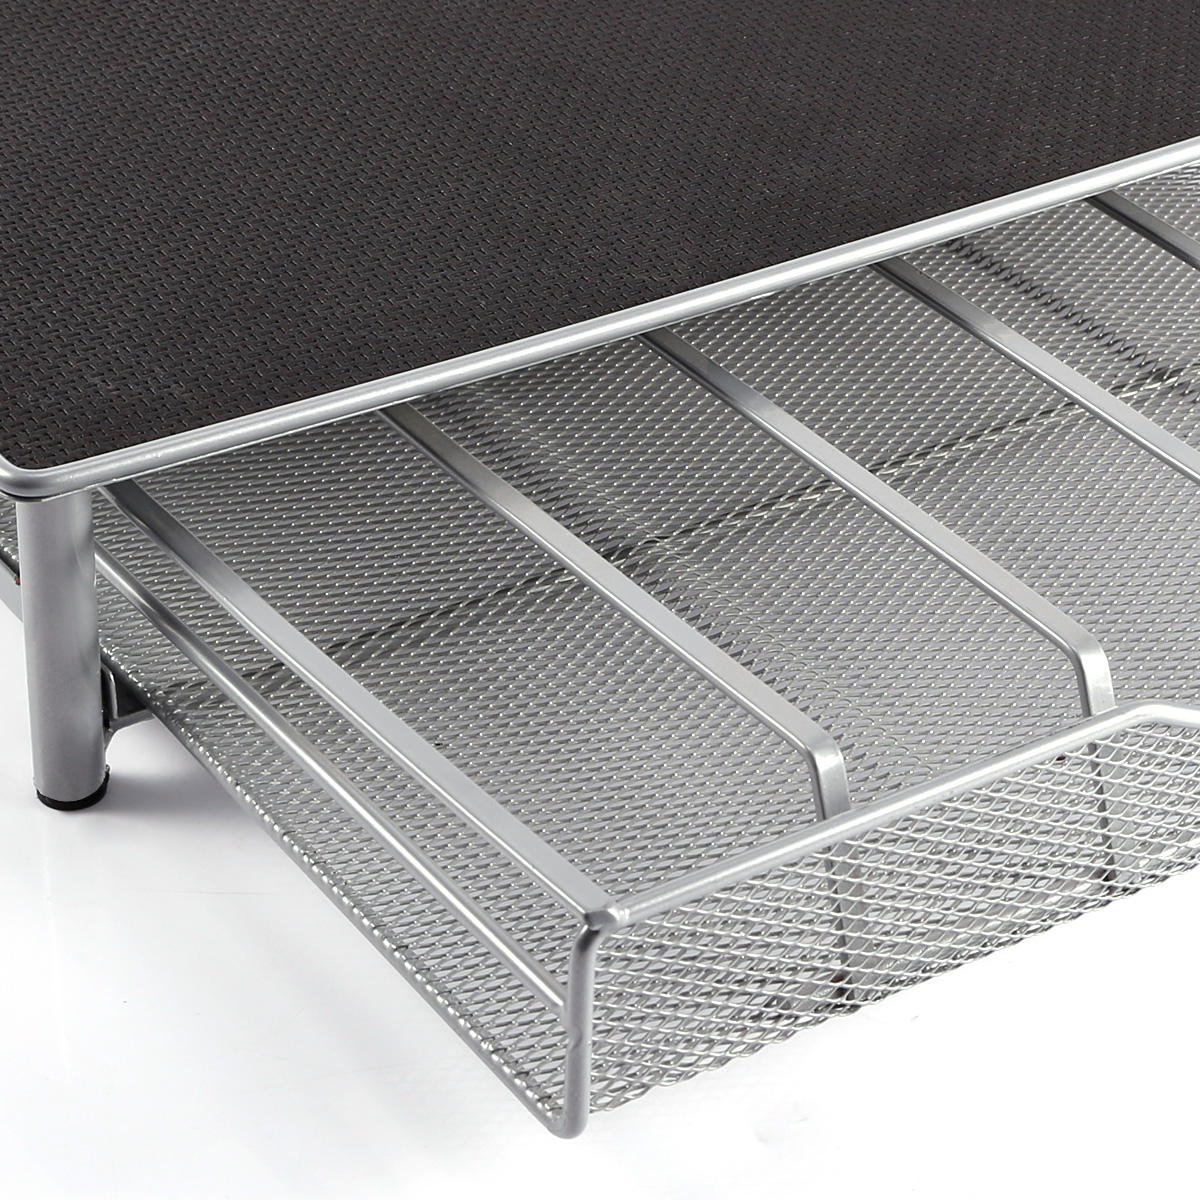 60 K Cup Holder Rack Storage For Coffee Pod Chrome Drawer